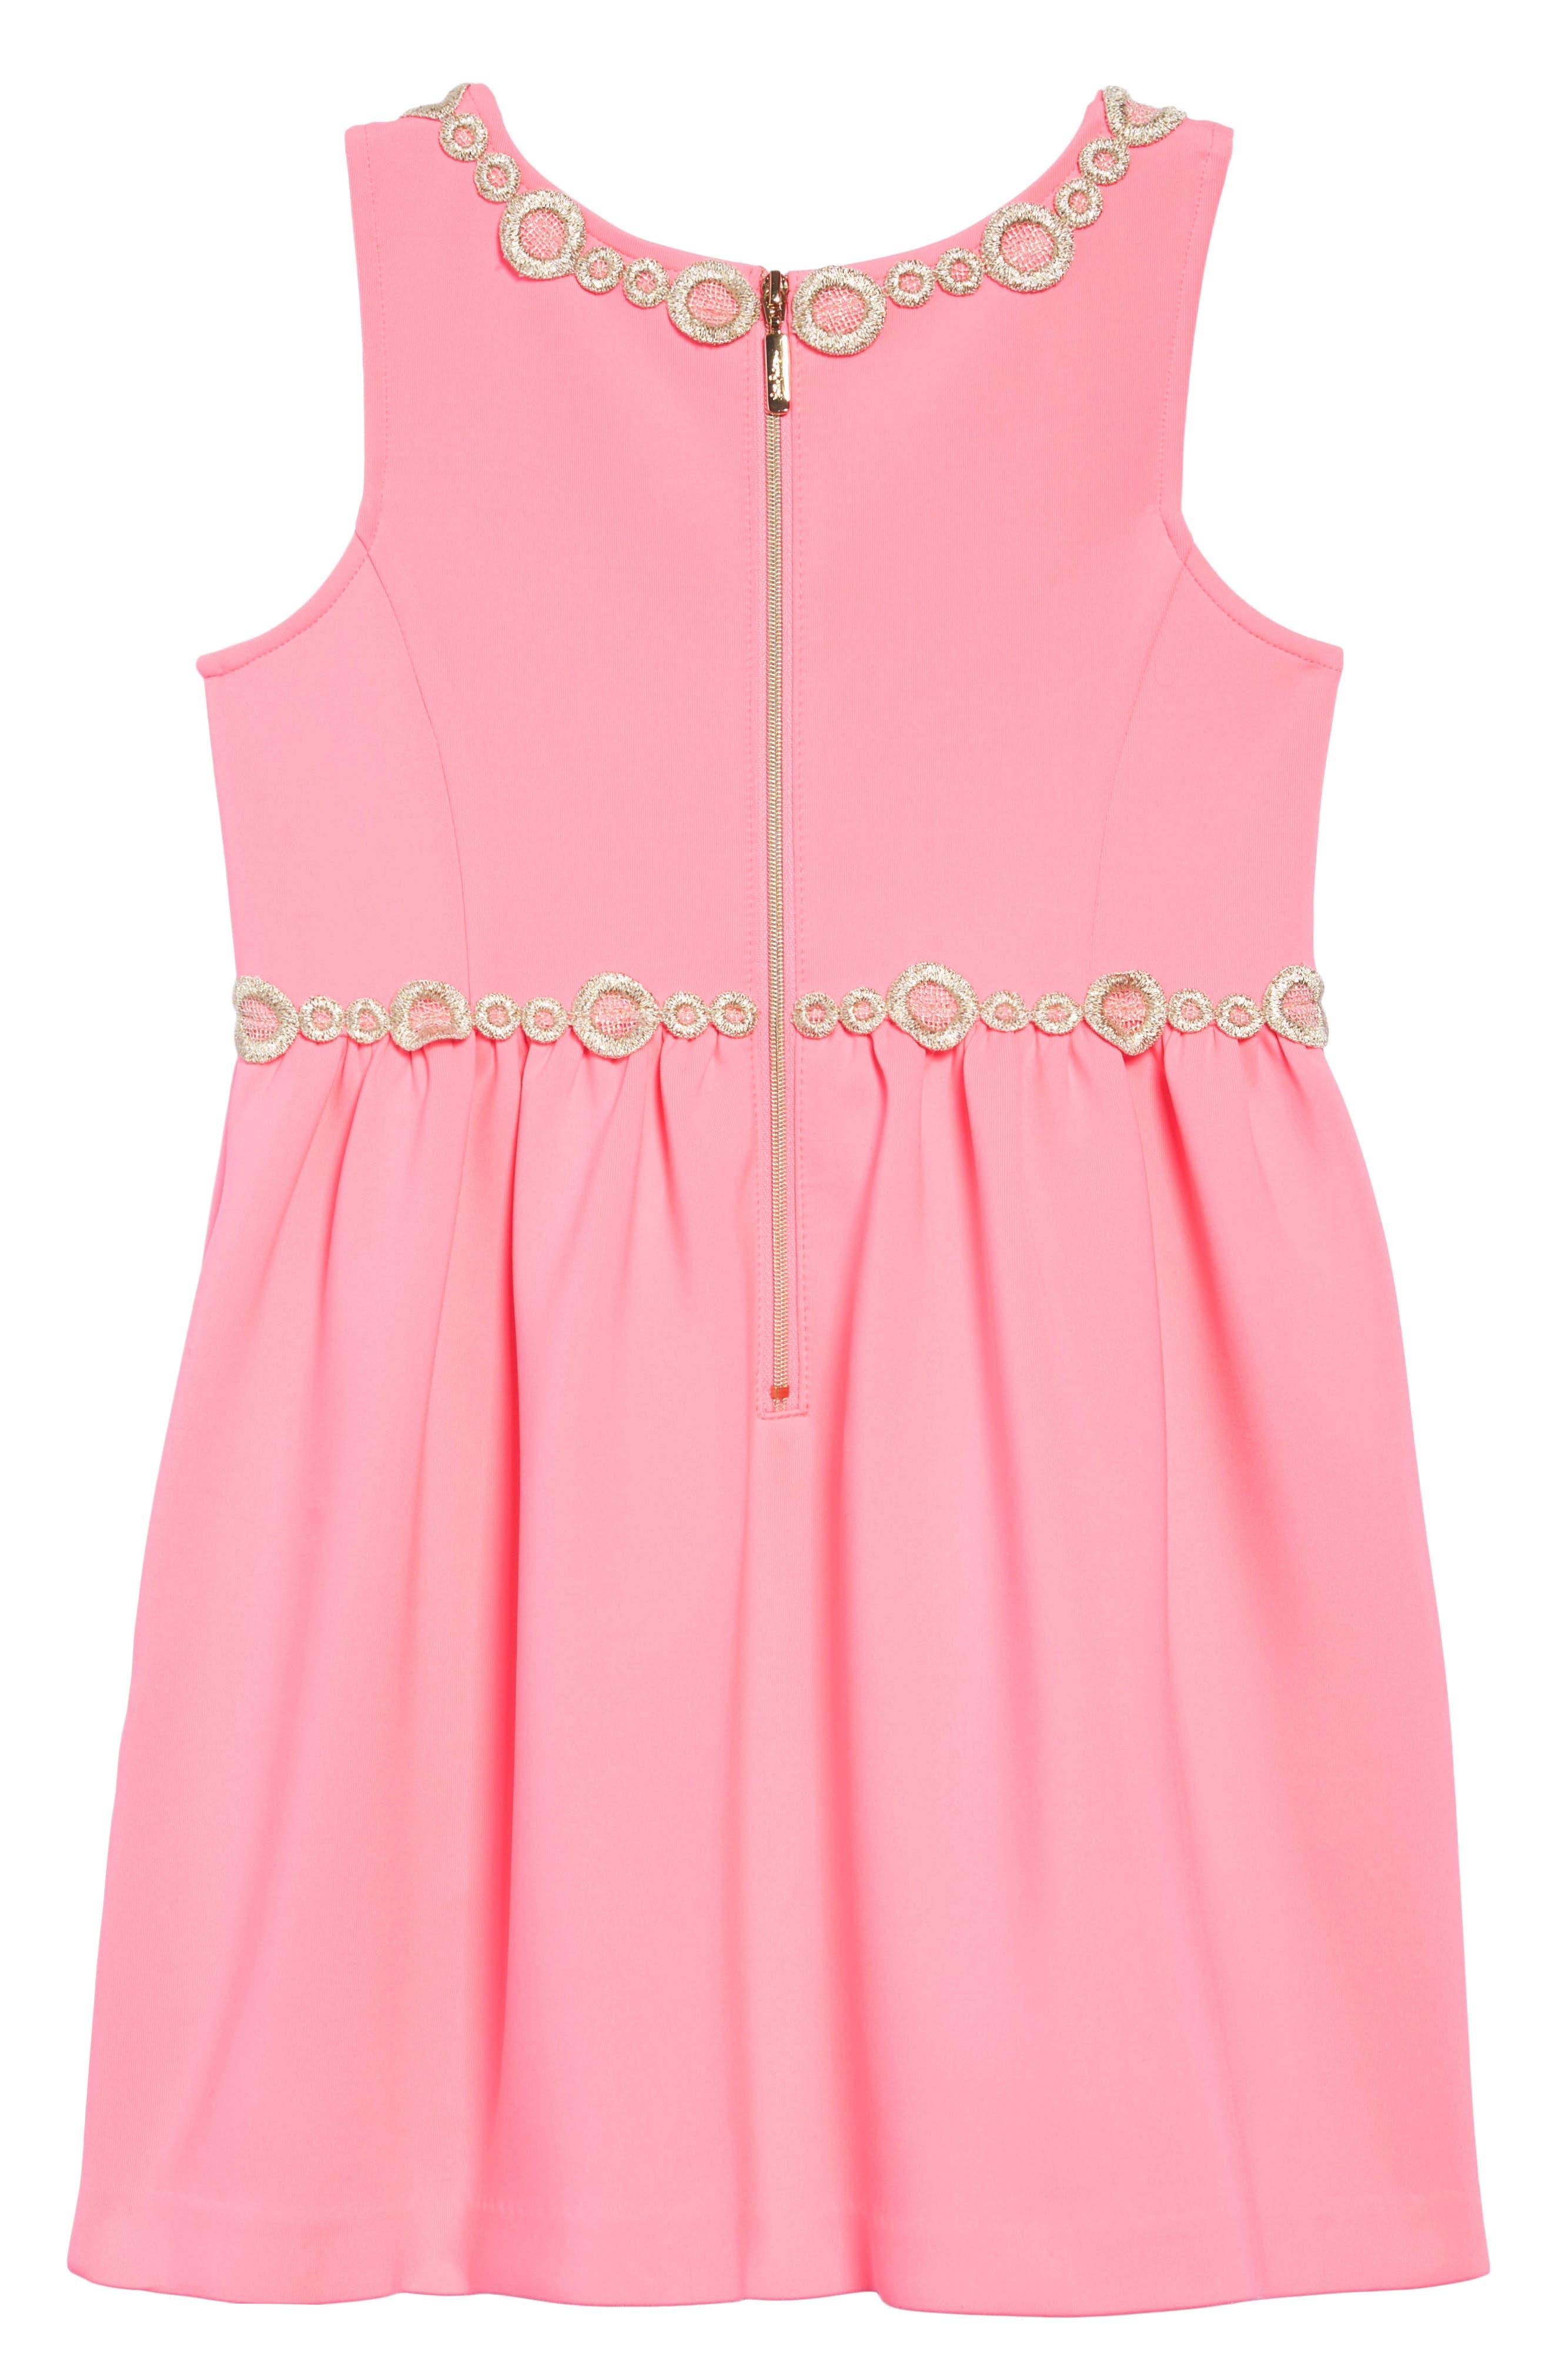 Baylee A-Line Dress,                             Alternate thumbnail 2, color,                             PINK SUNSET